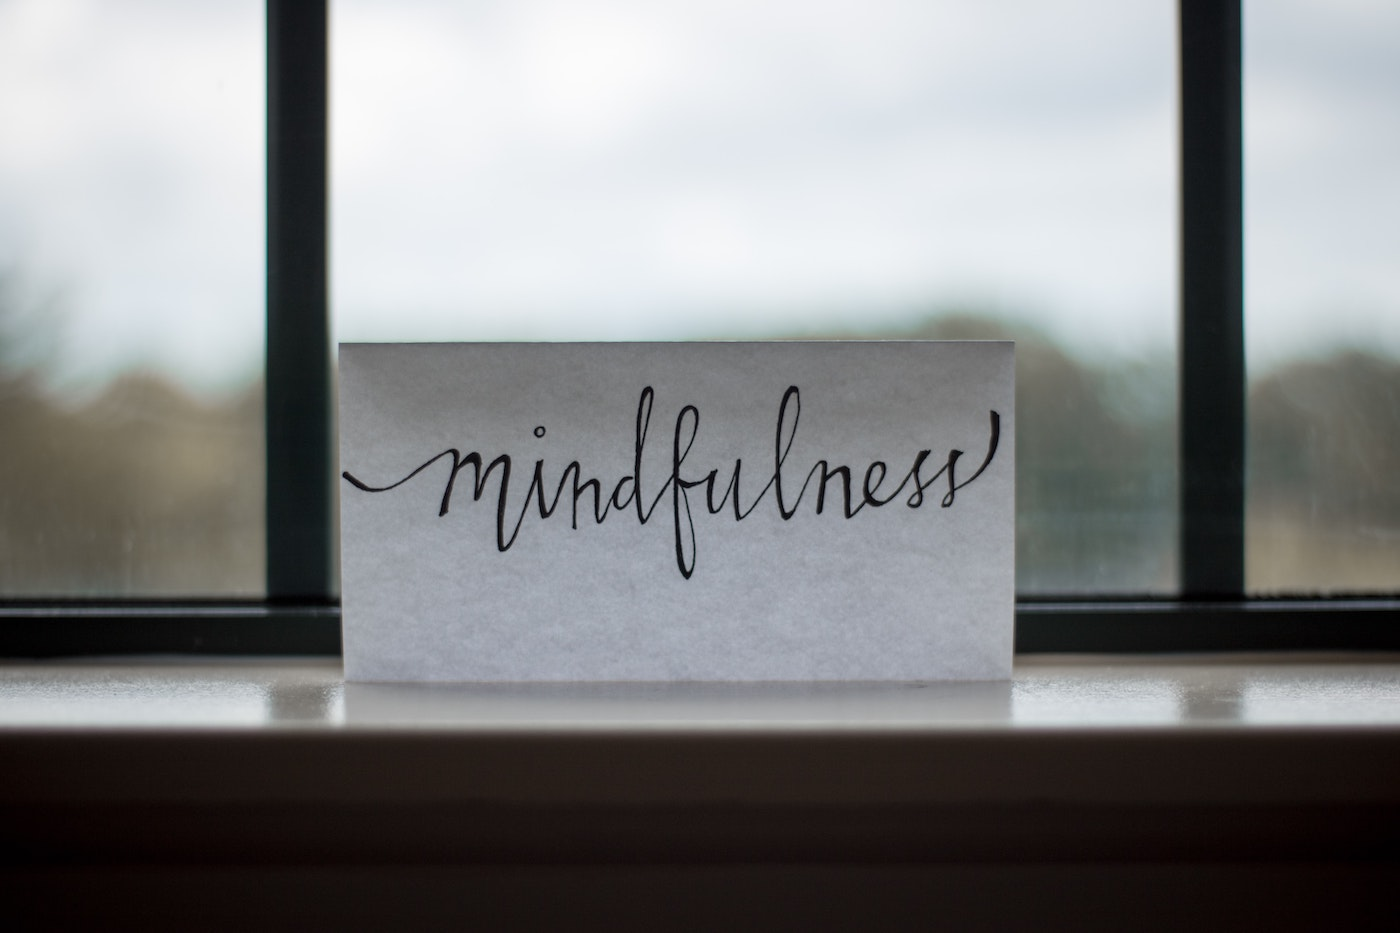 Mindfulness tips